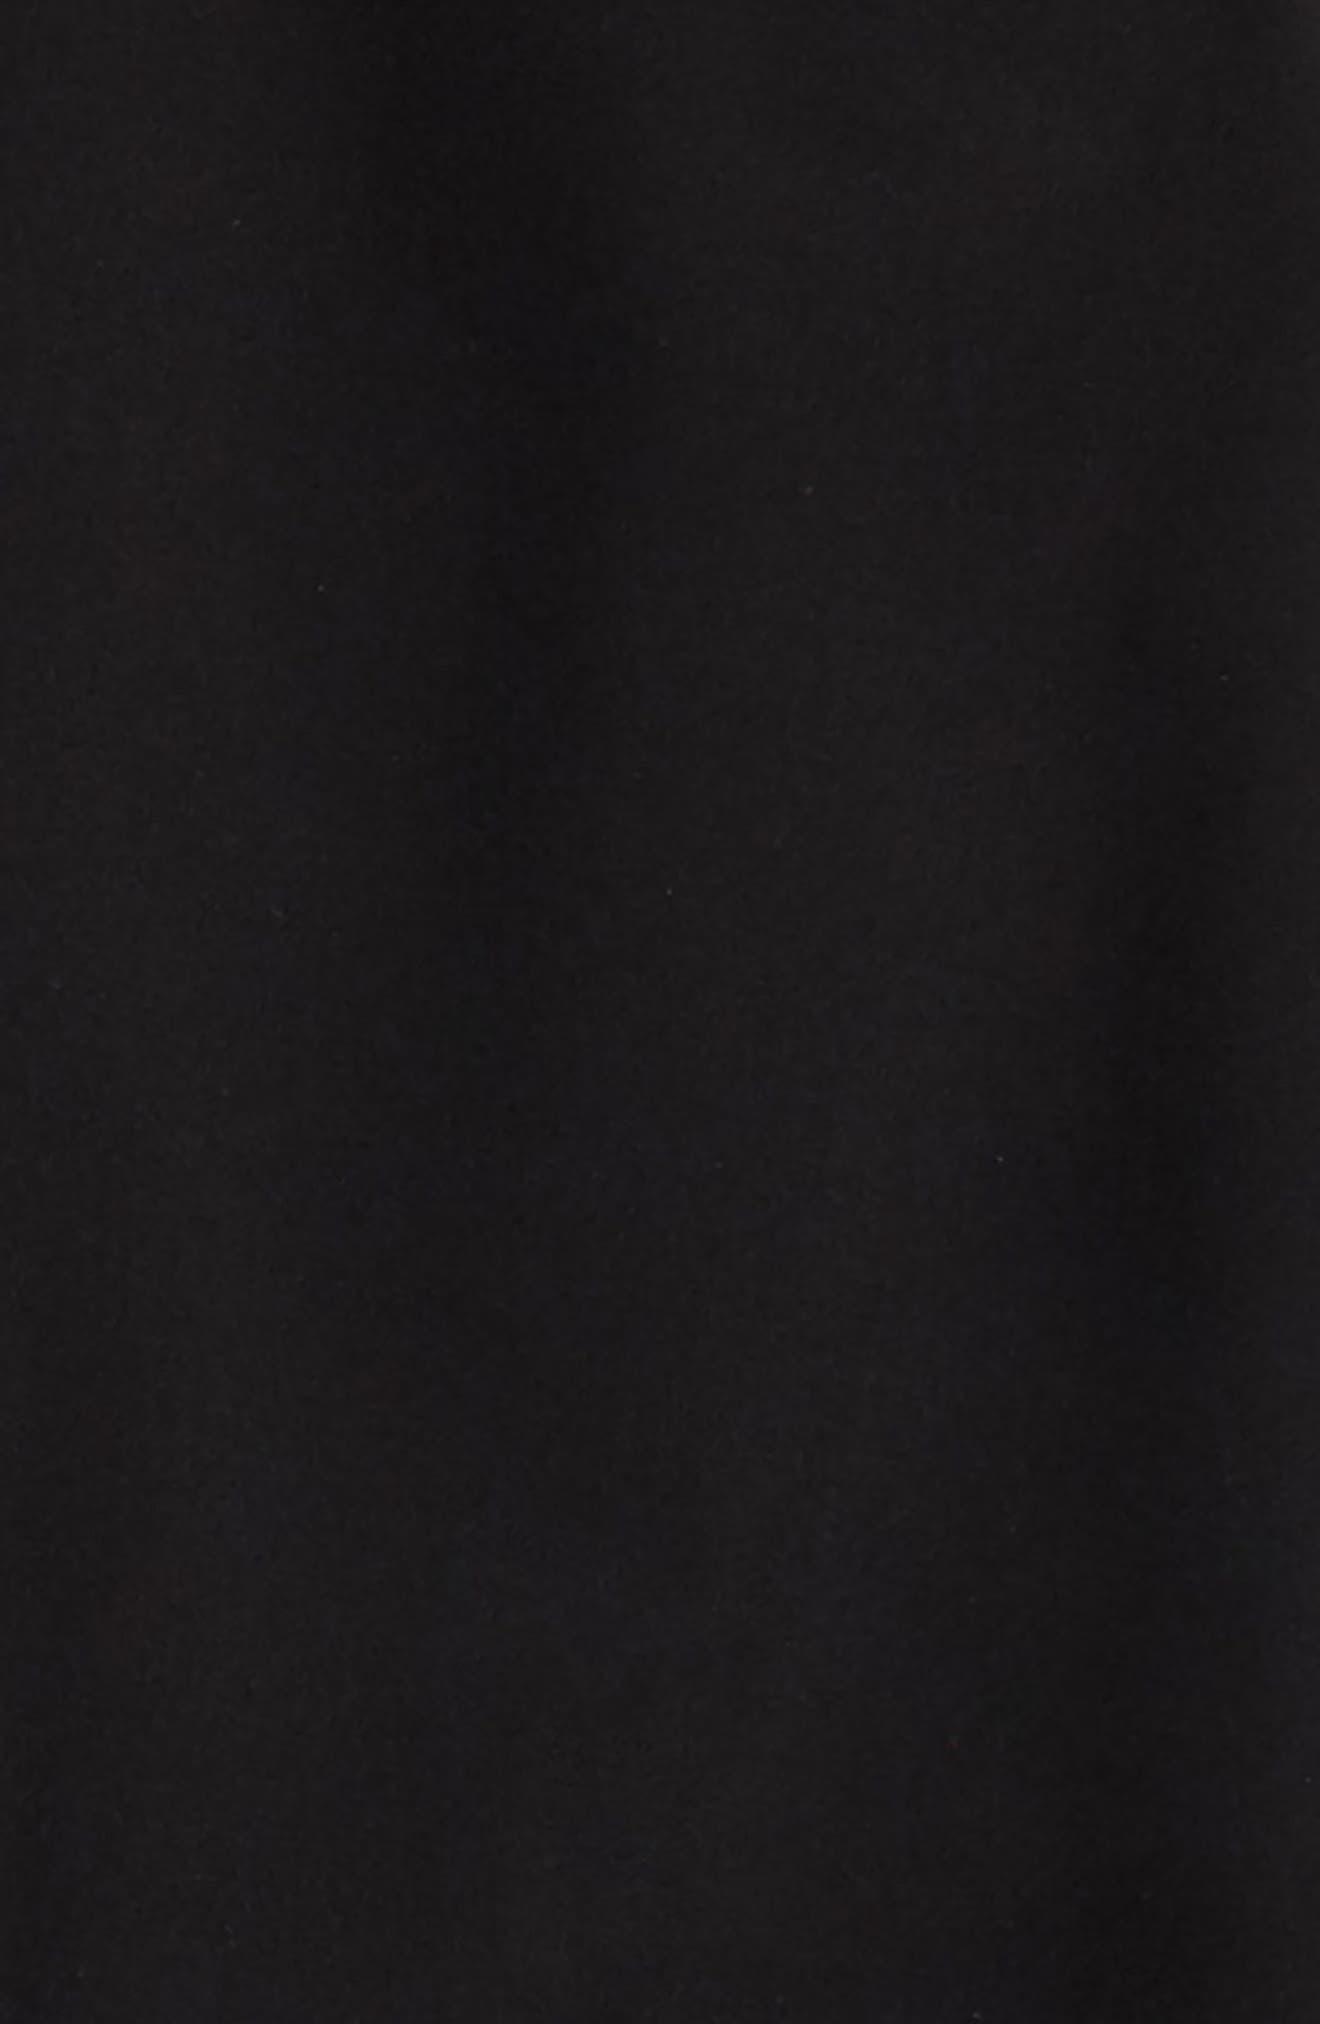 Mighty Softshell Pants,                             Alternate thumbnail 2, color,                             Black